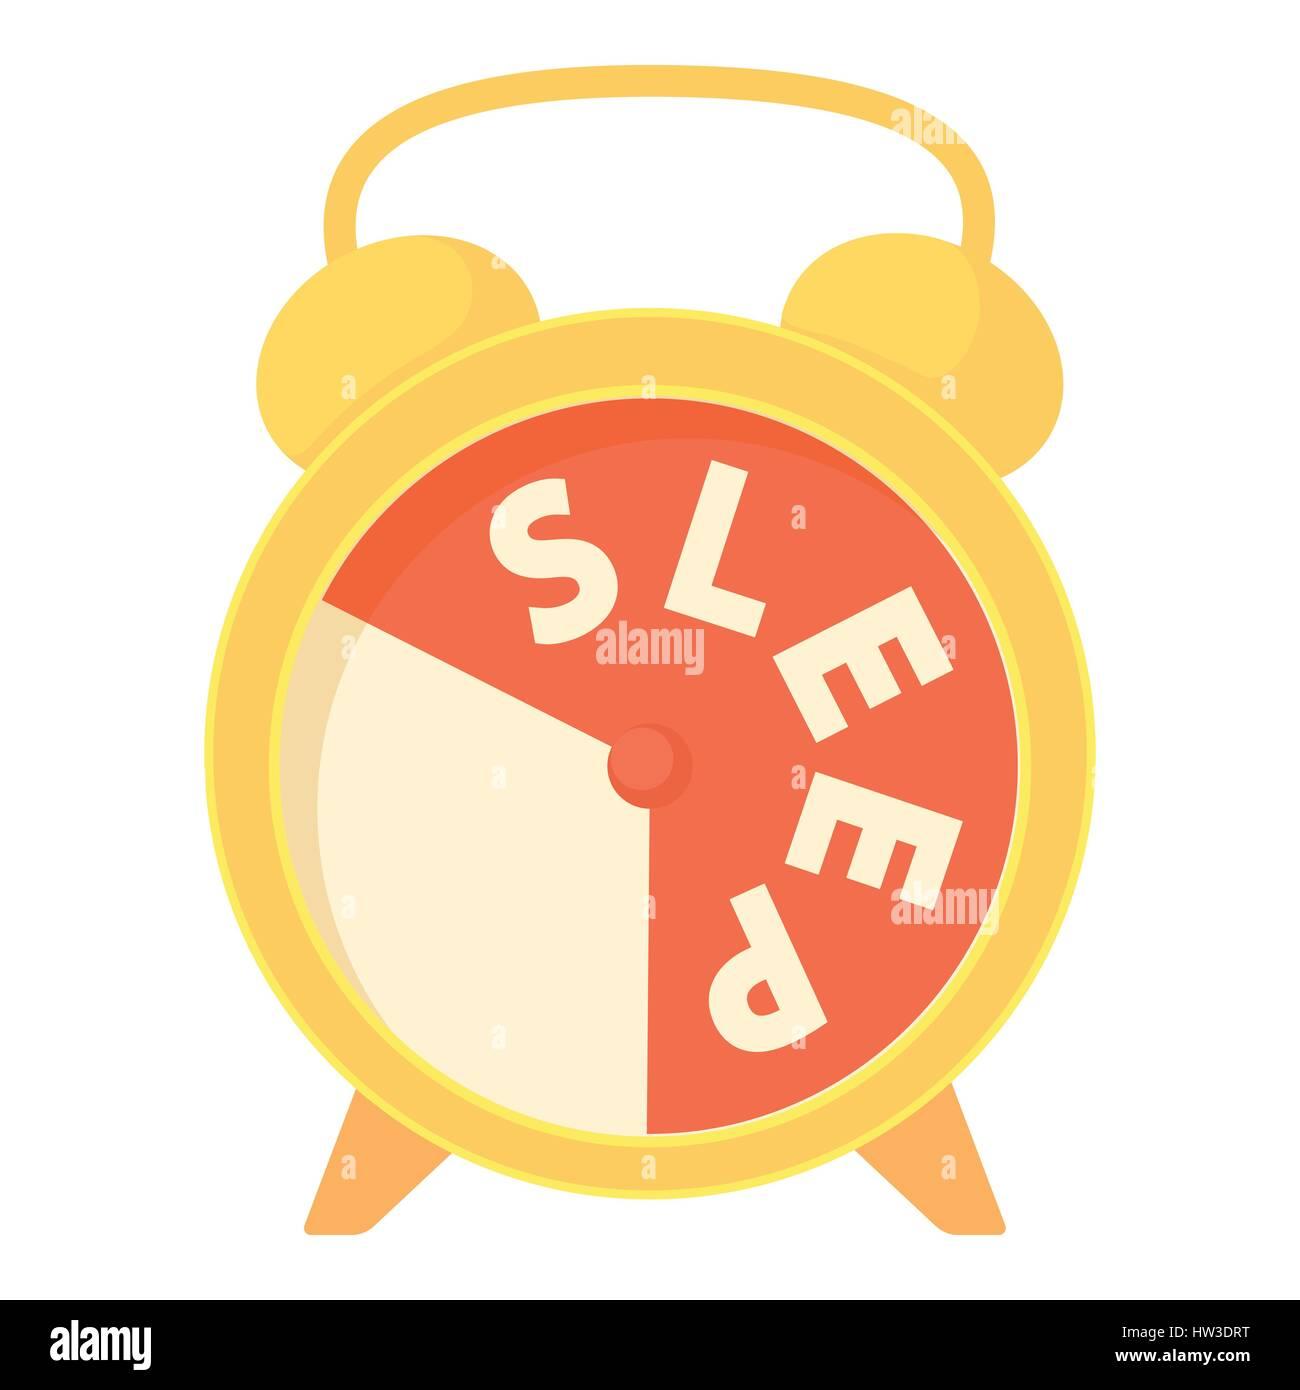 my sleep clock instructions